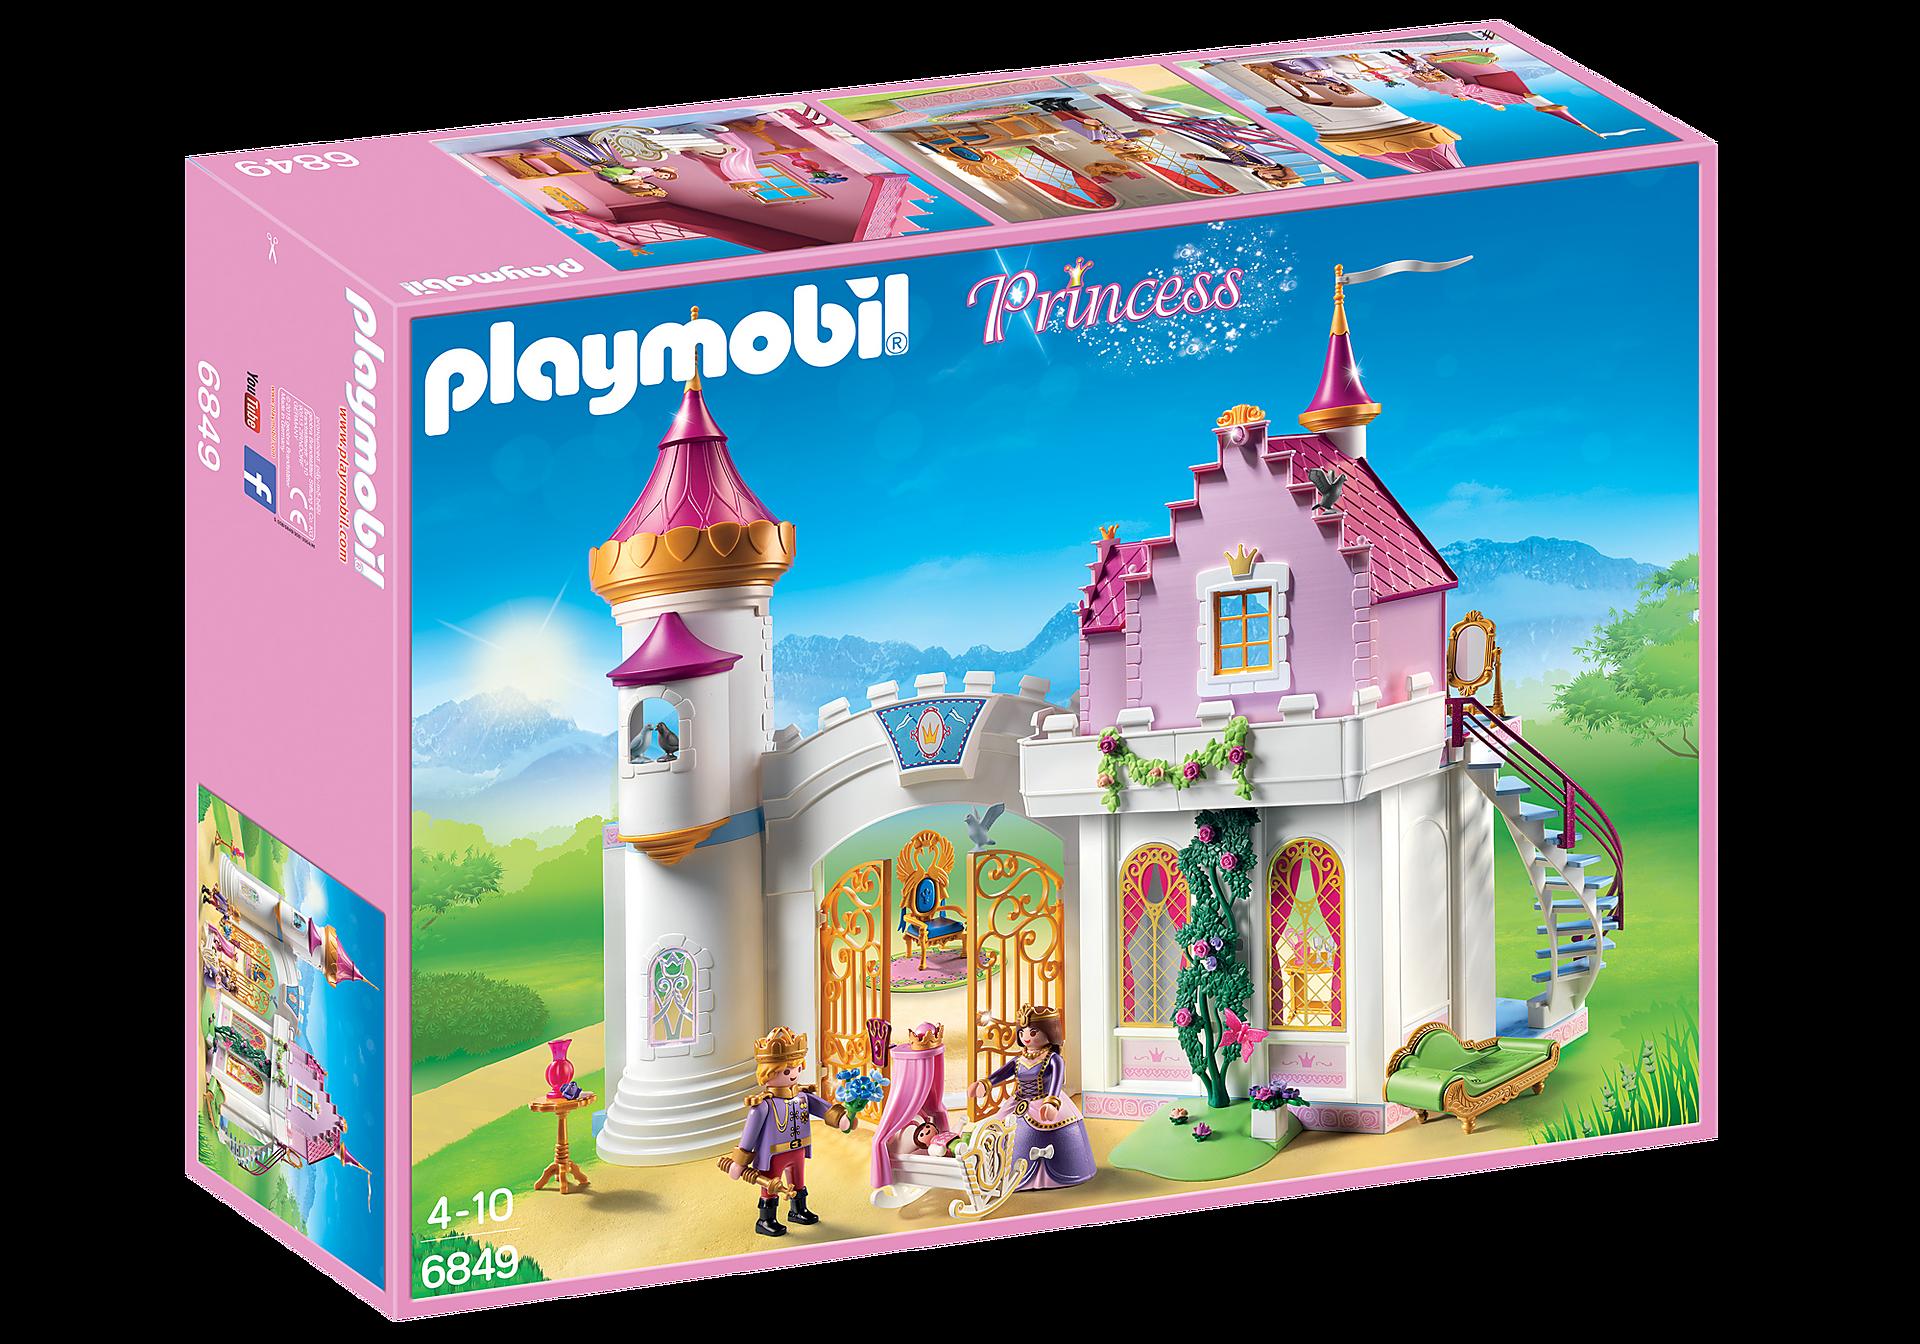 http://media.playmobil.com/i/playmobil/6849_product_box_front/Замок Принцессы: Королевская Резиденция